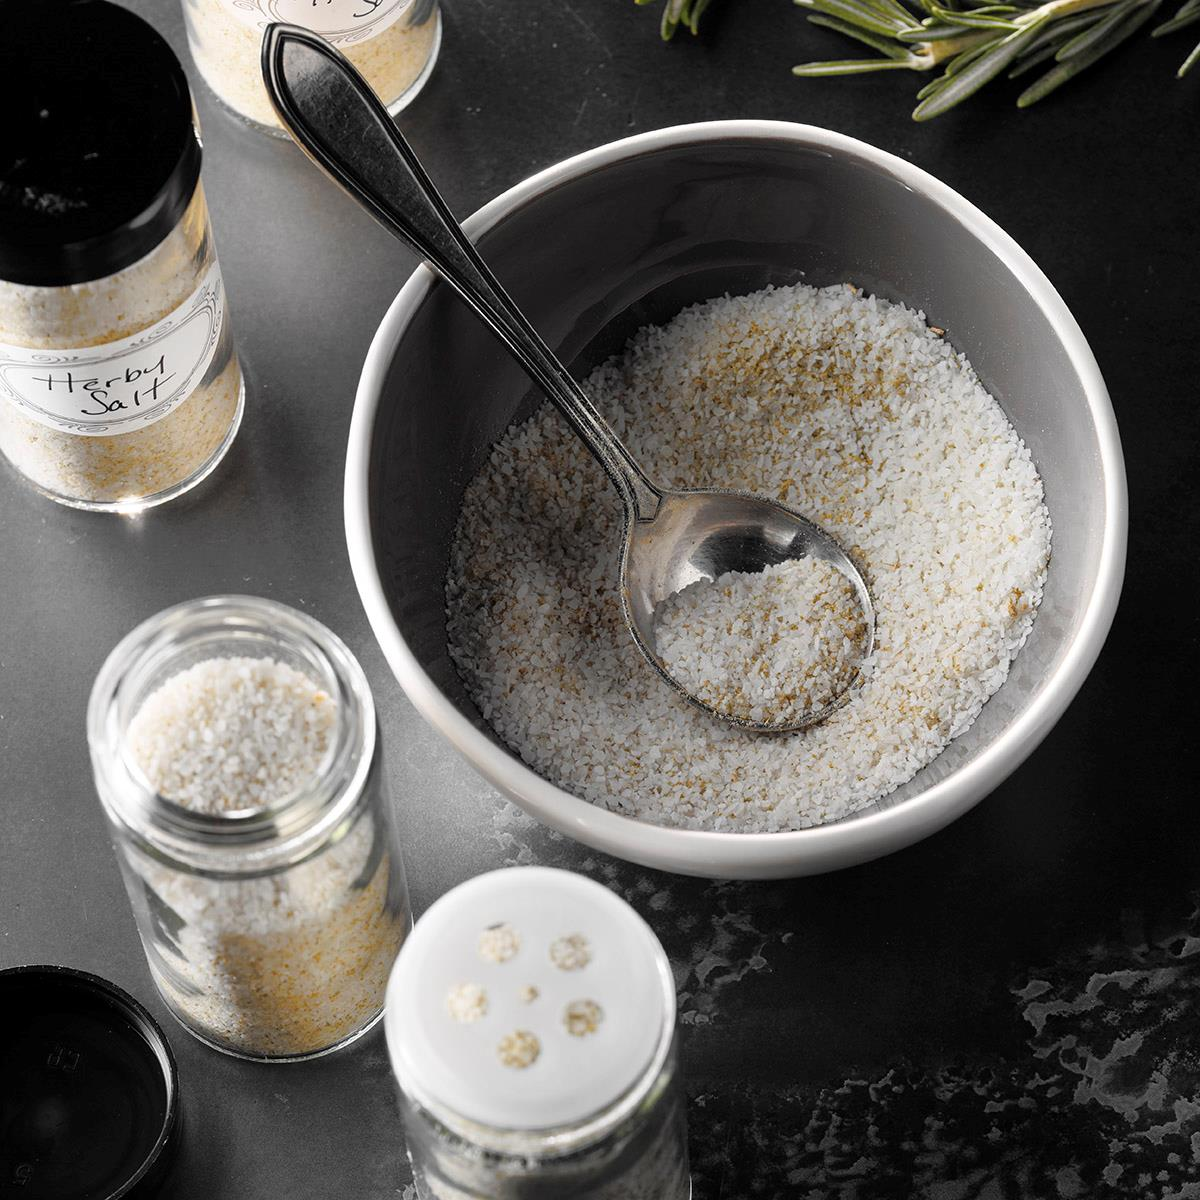 Momma Watts' Crazy Herby Salt Blend image